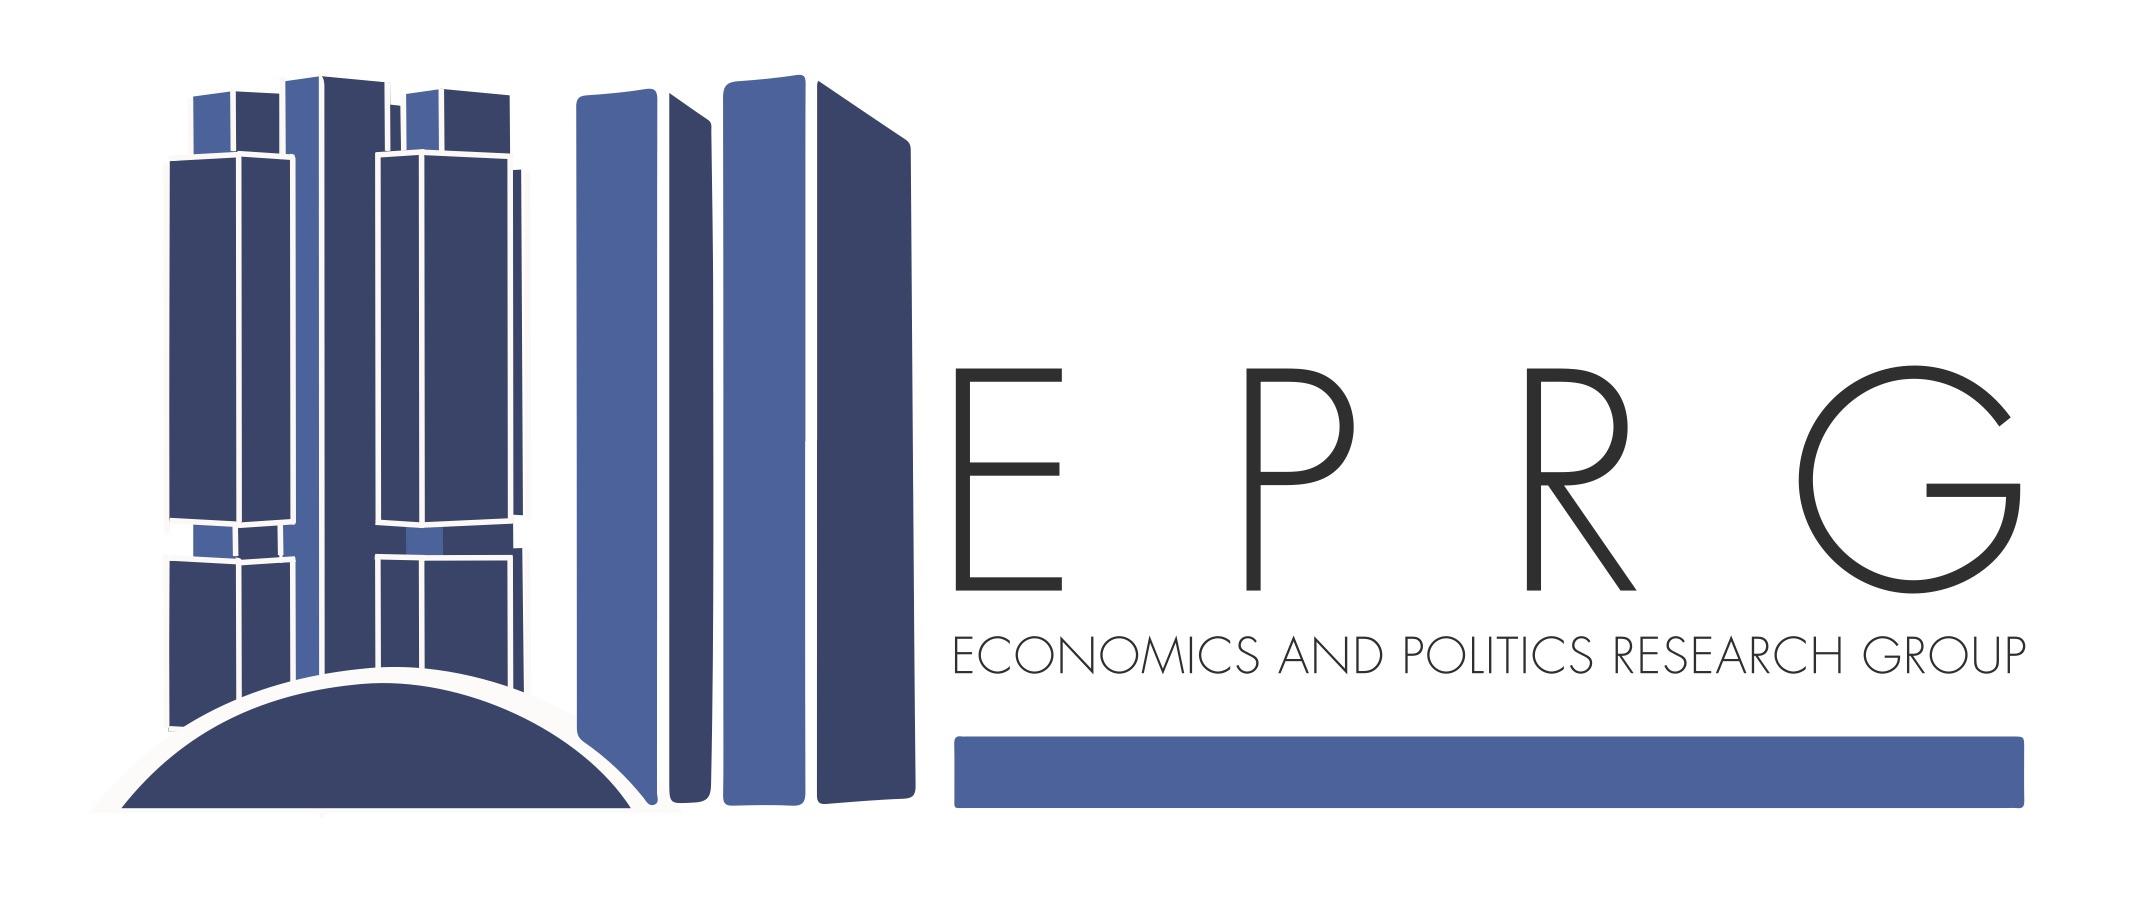 The Representation of East Asia in Latin American Legislatures por Hirokazu Kikuchi, Institute of Developing Economies, IDE-JETRO, Japan